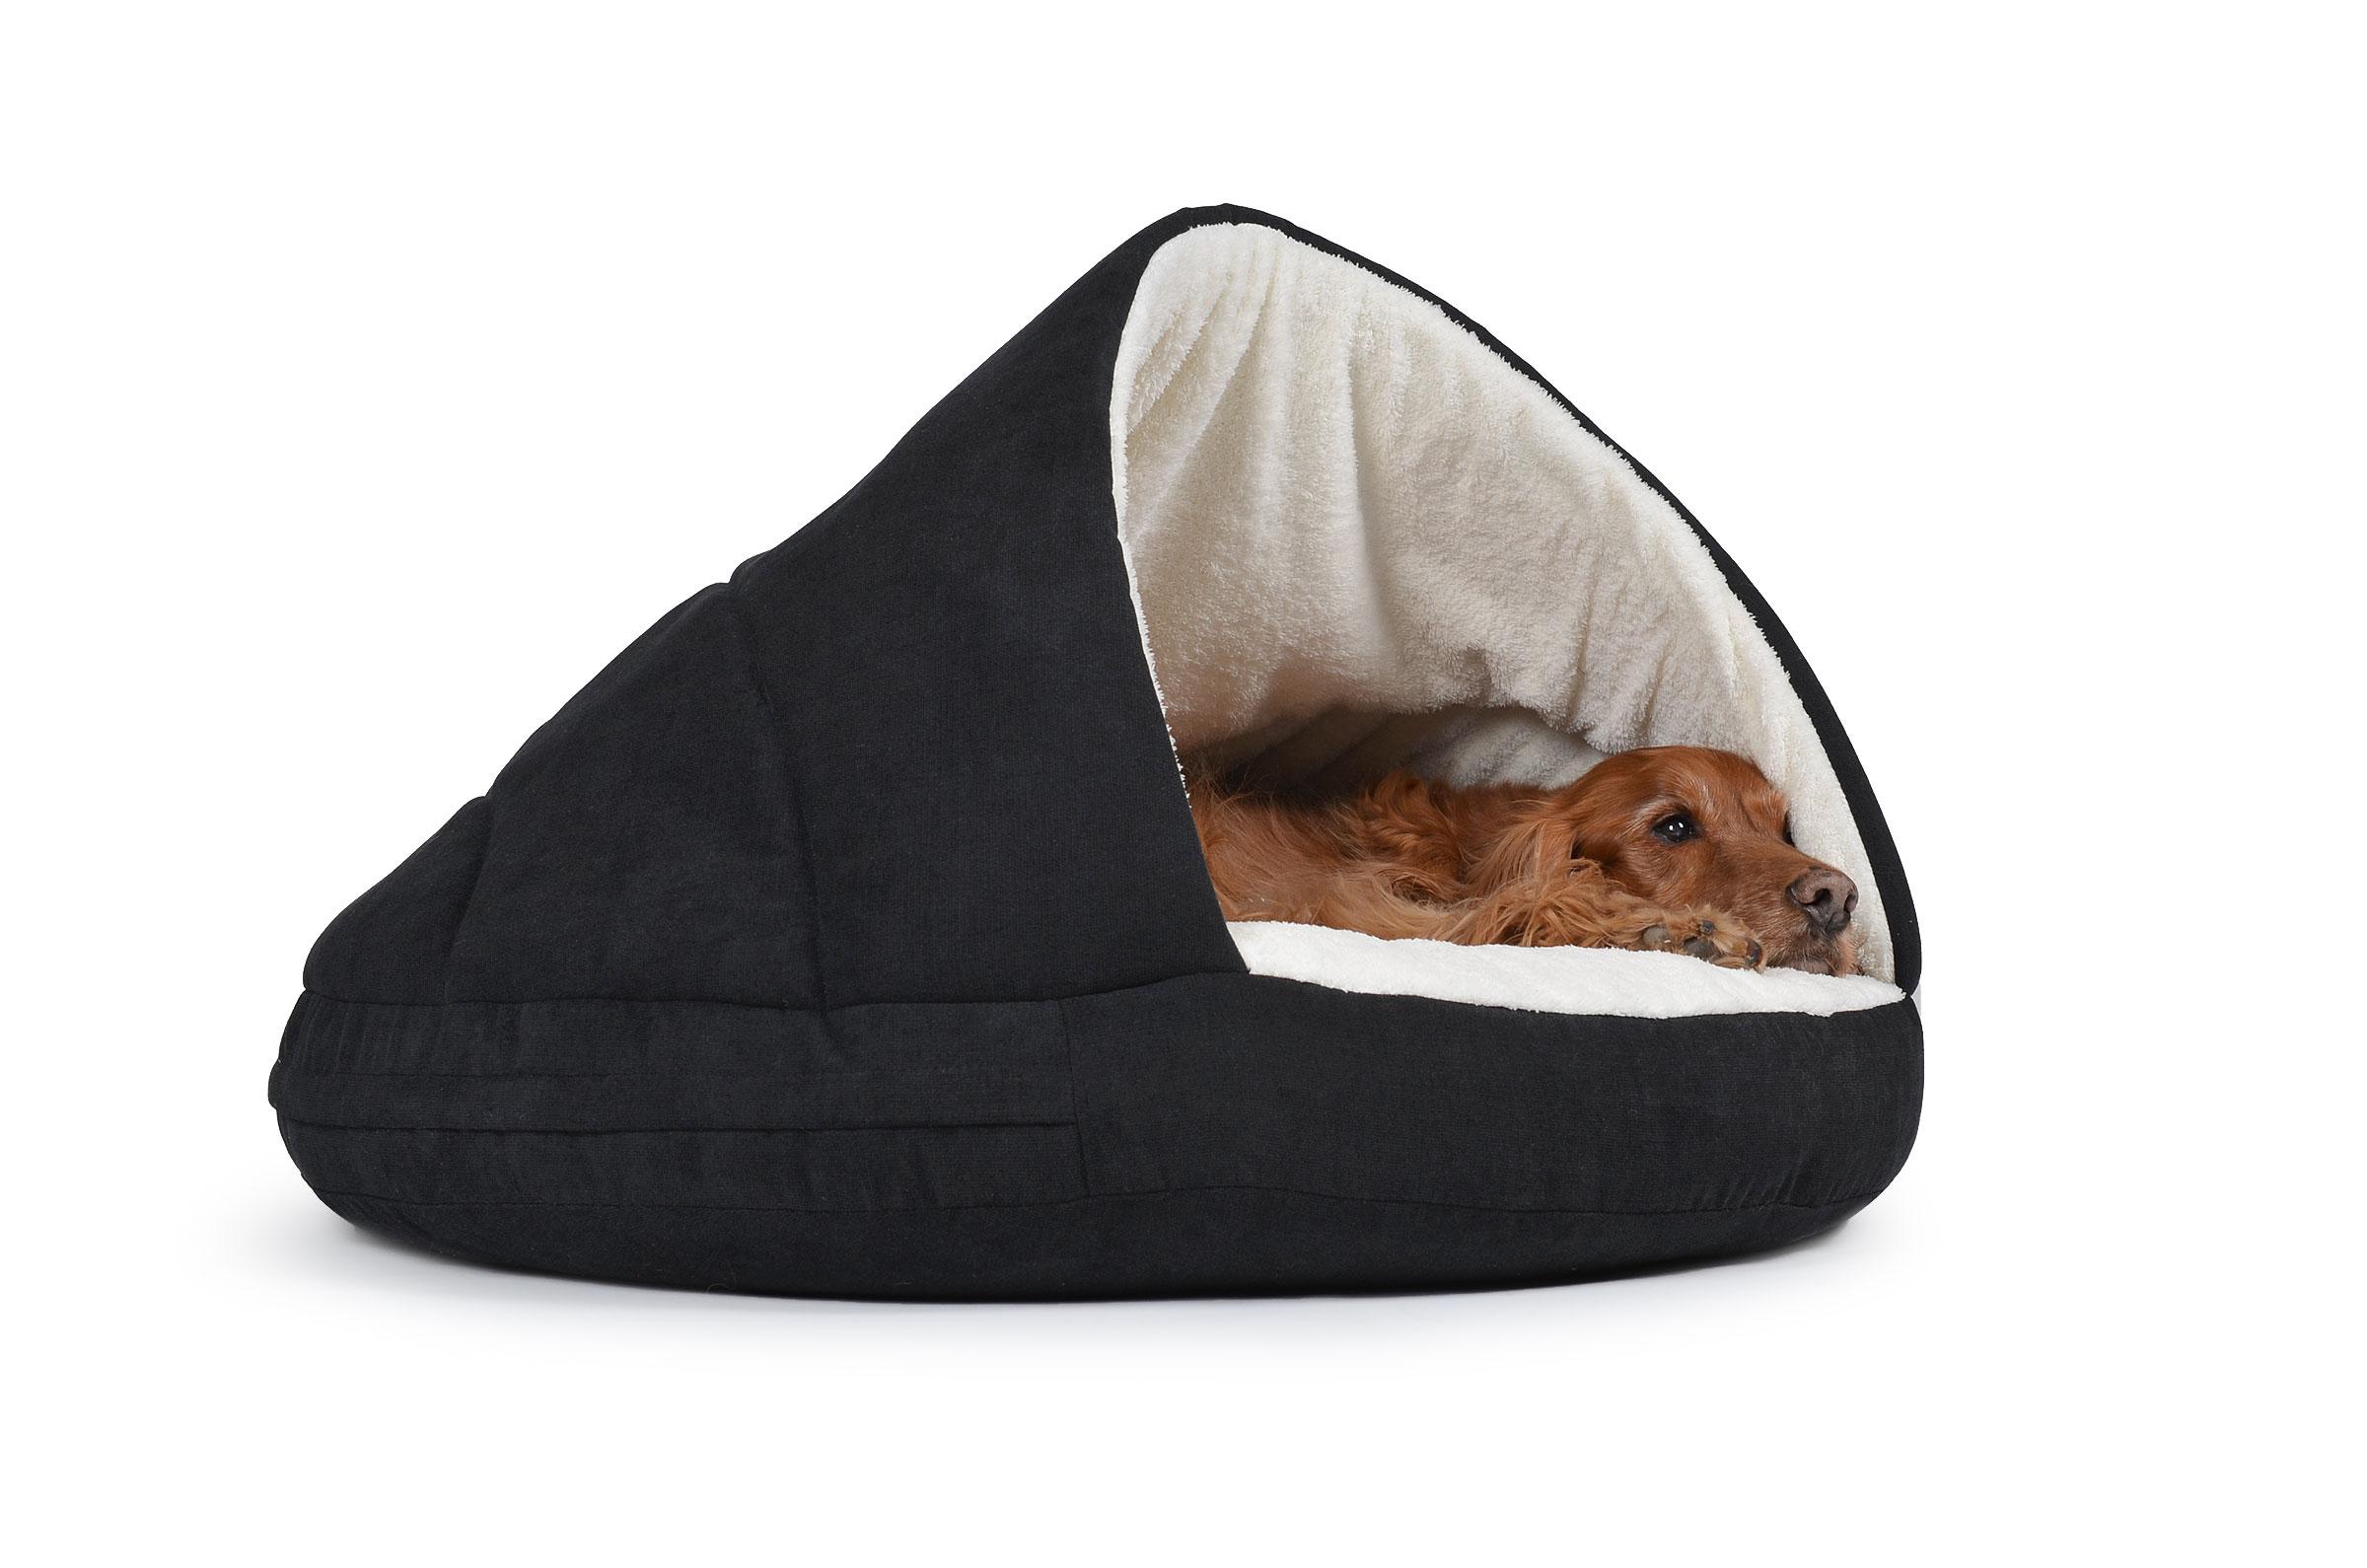 Schöne Hundebetten comfort hundehöhle shell schöne große hundehöhle